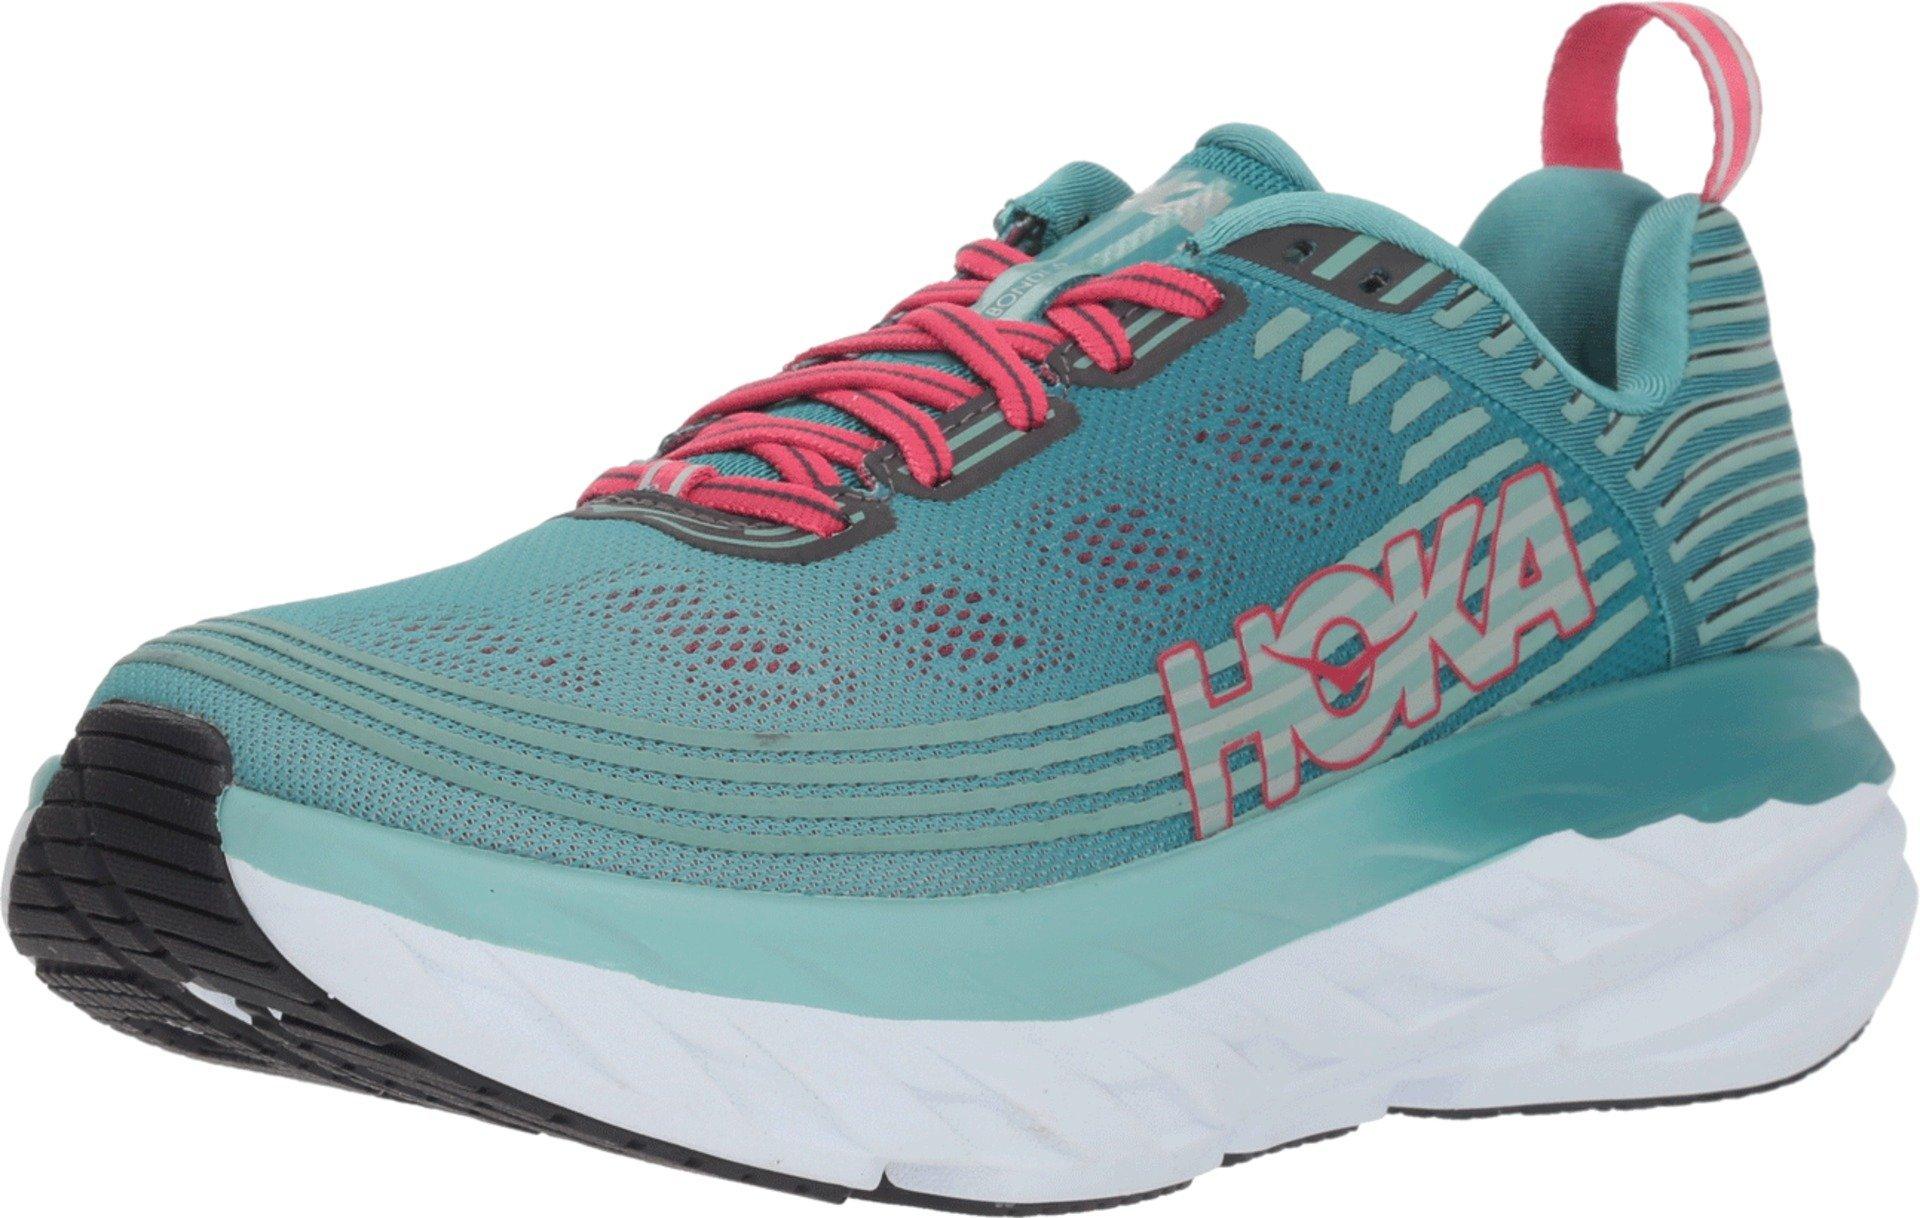 HOKA ONE ONE Men's Bondi 6 Running Shoe (5.5, Blue/Green)